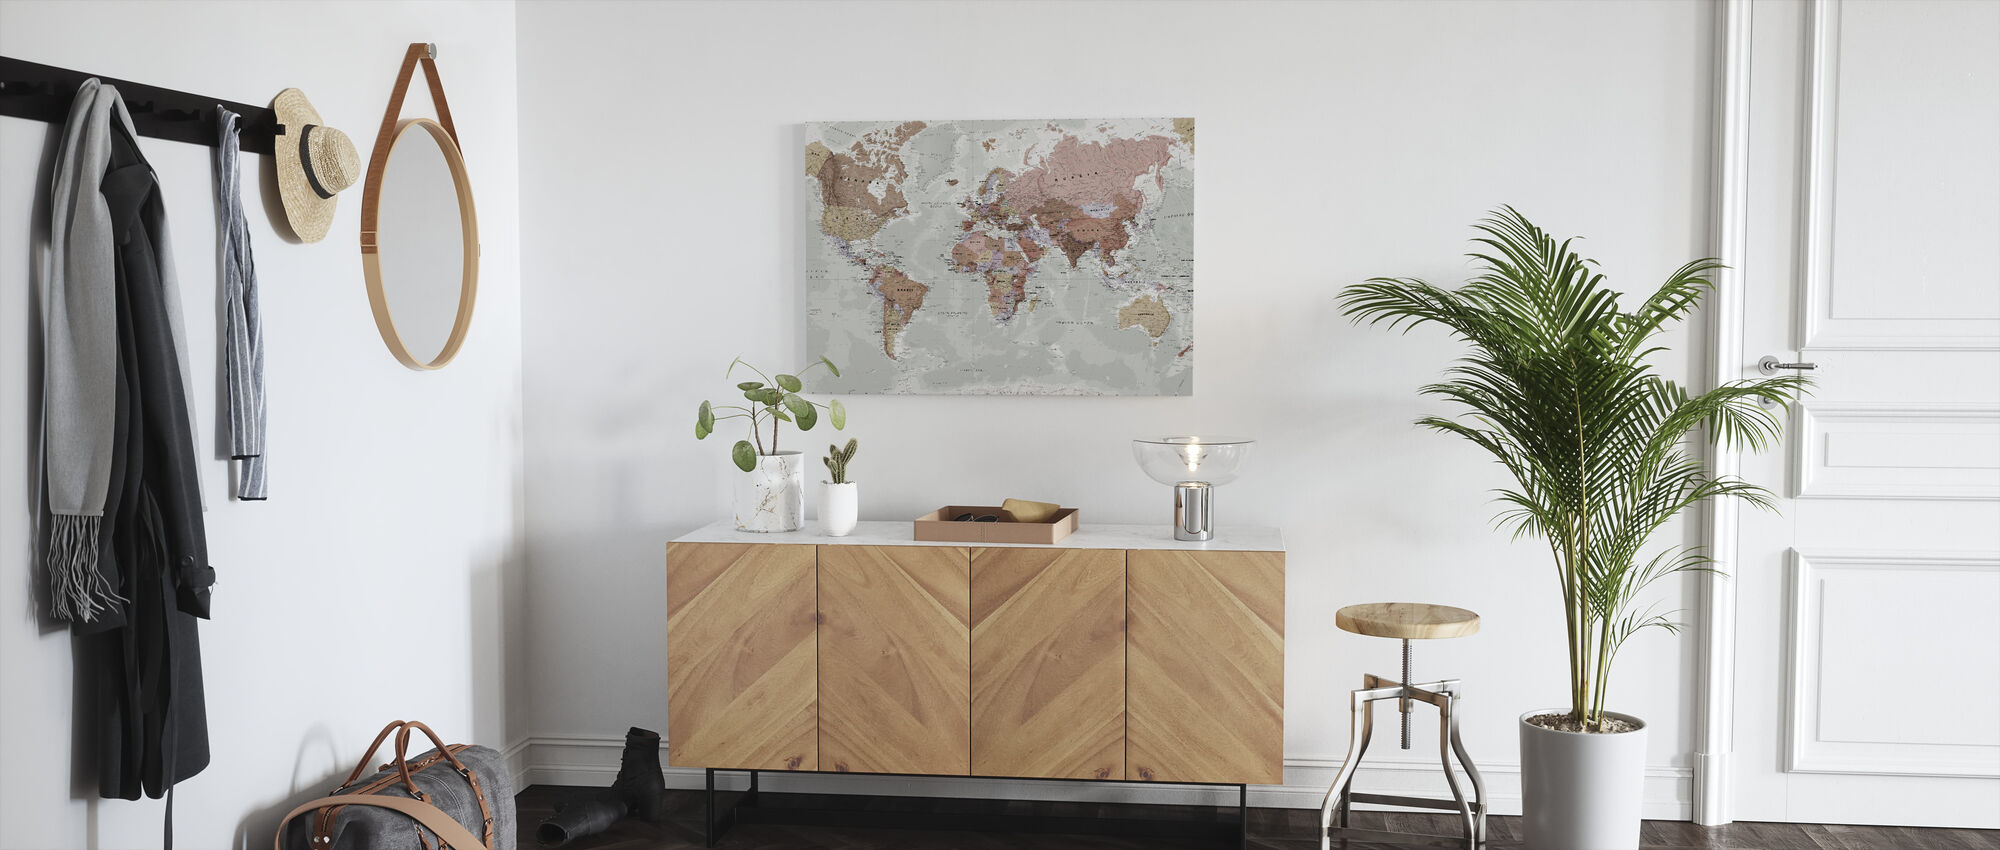 Executive Political World Map - Canvas print - Hallway